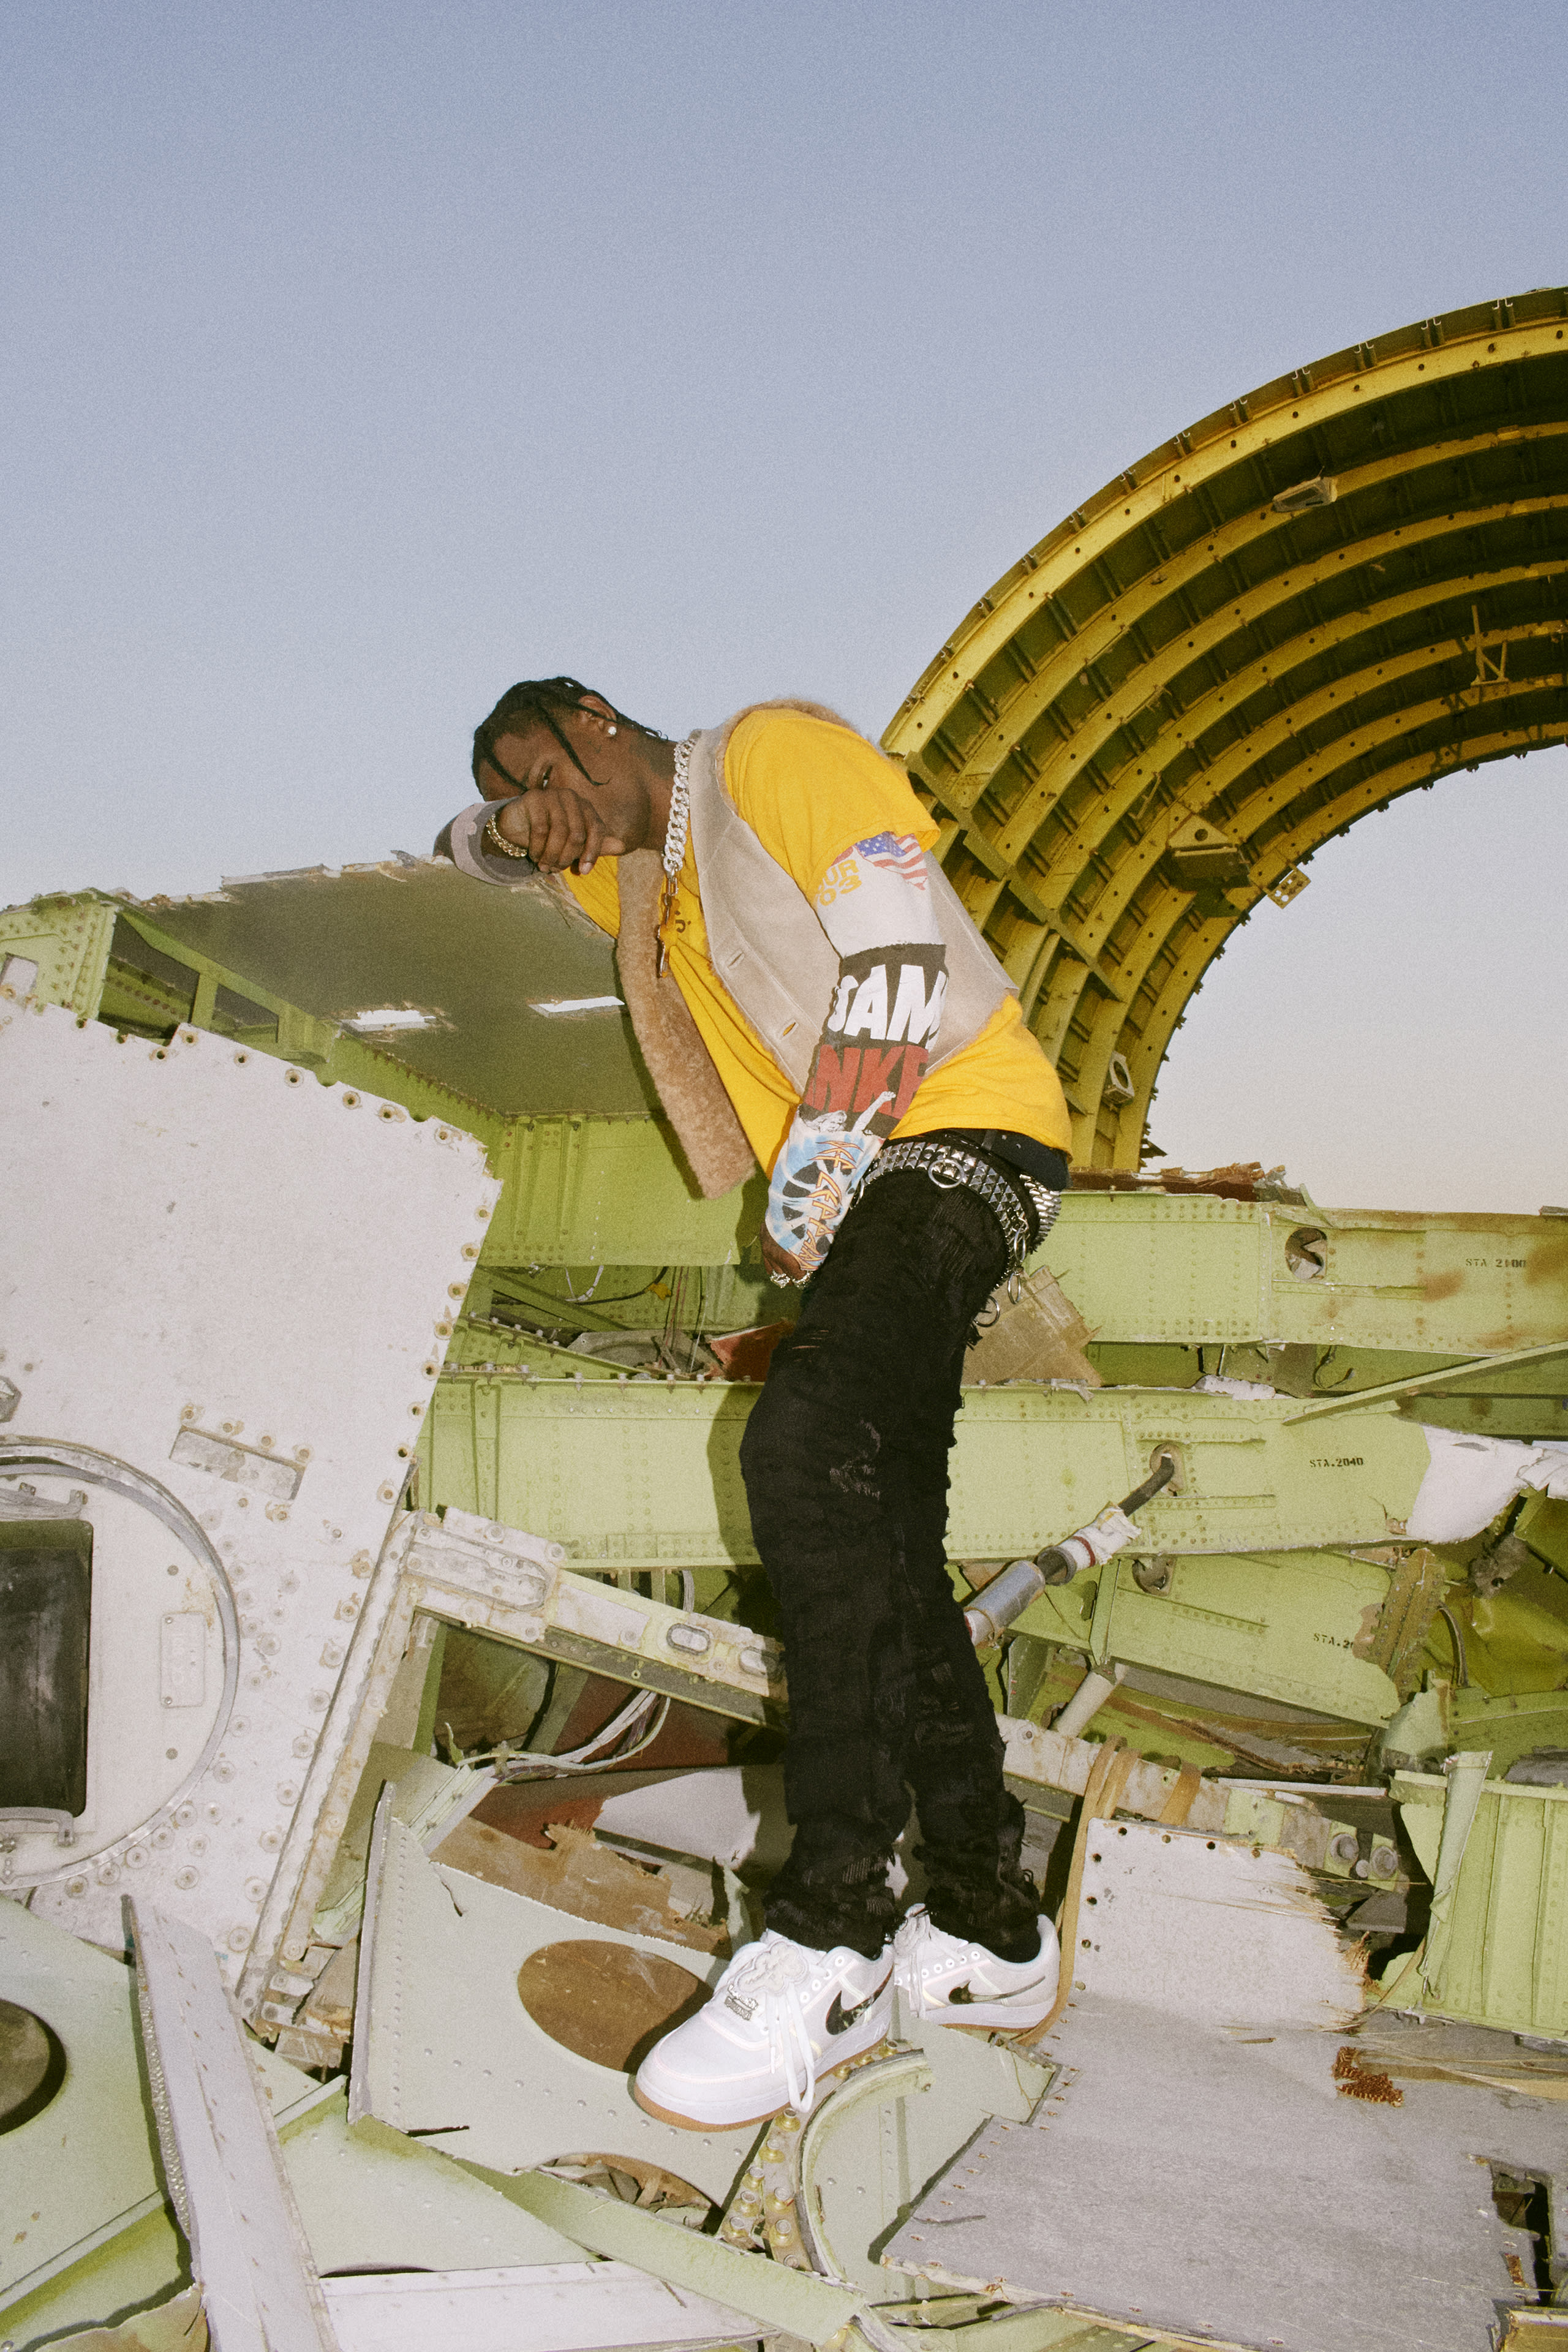 Nike Air Force 1 Roc A Fella Acronym Off White Travis Scott